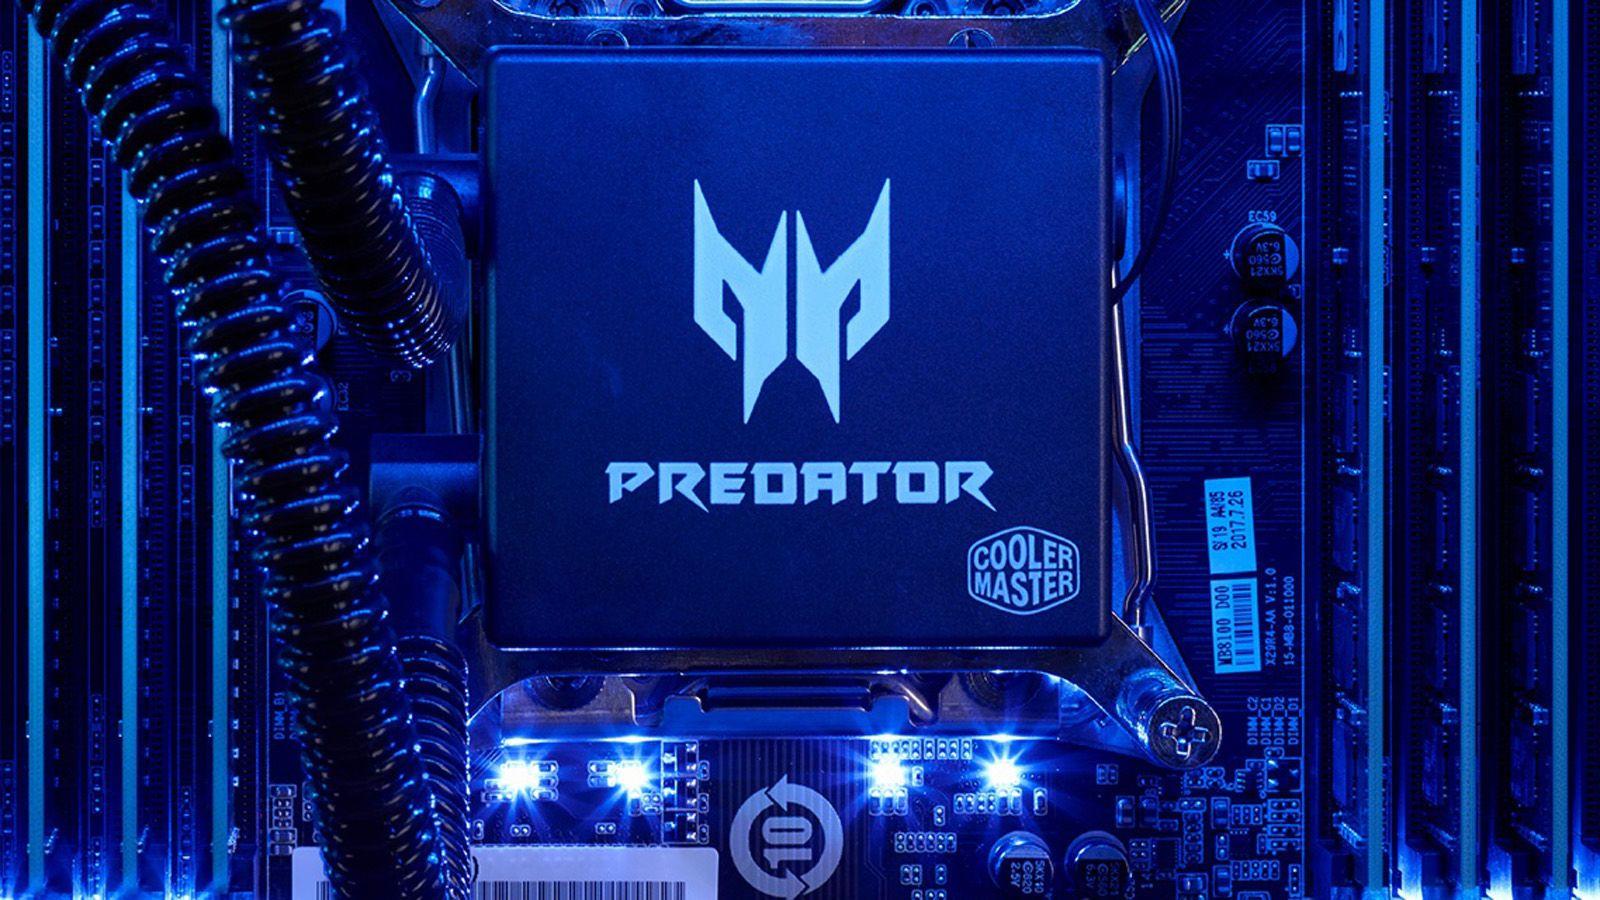 Acer Predator Logo Wallpapers on WallpaperDog